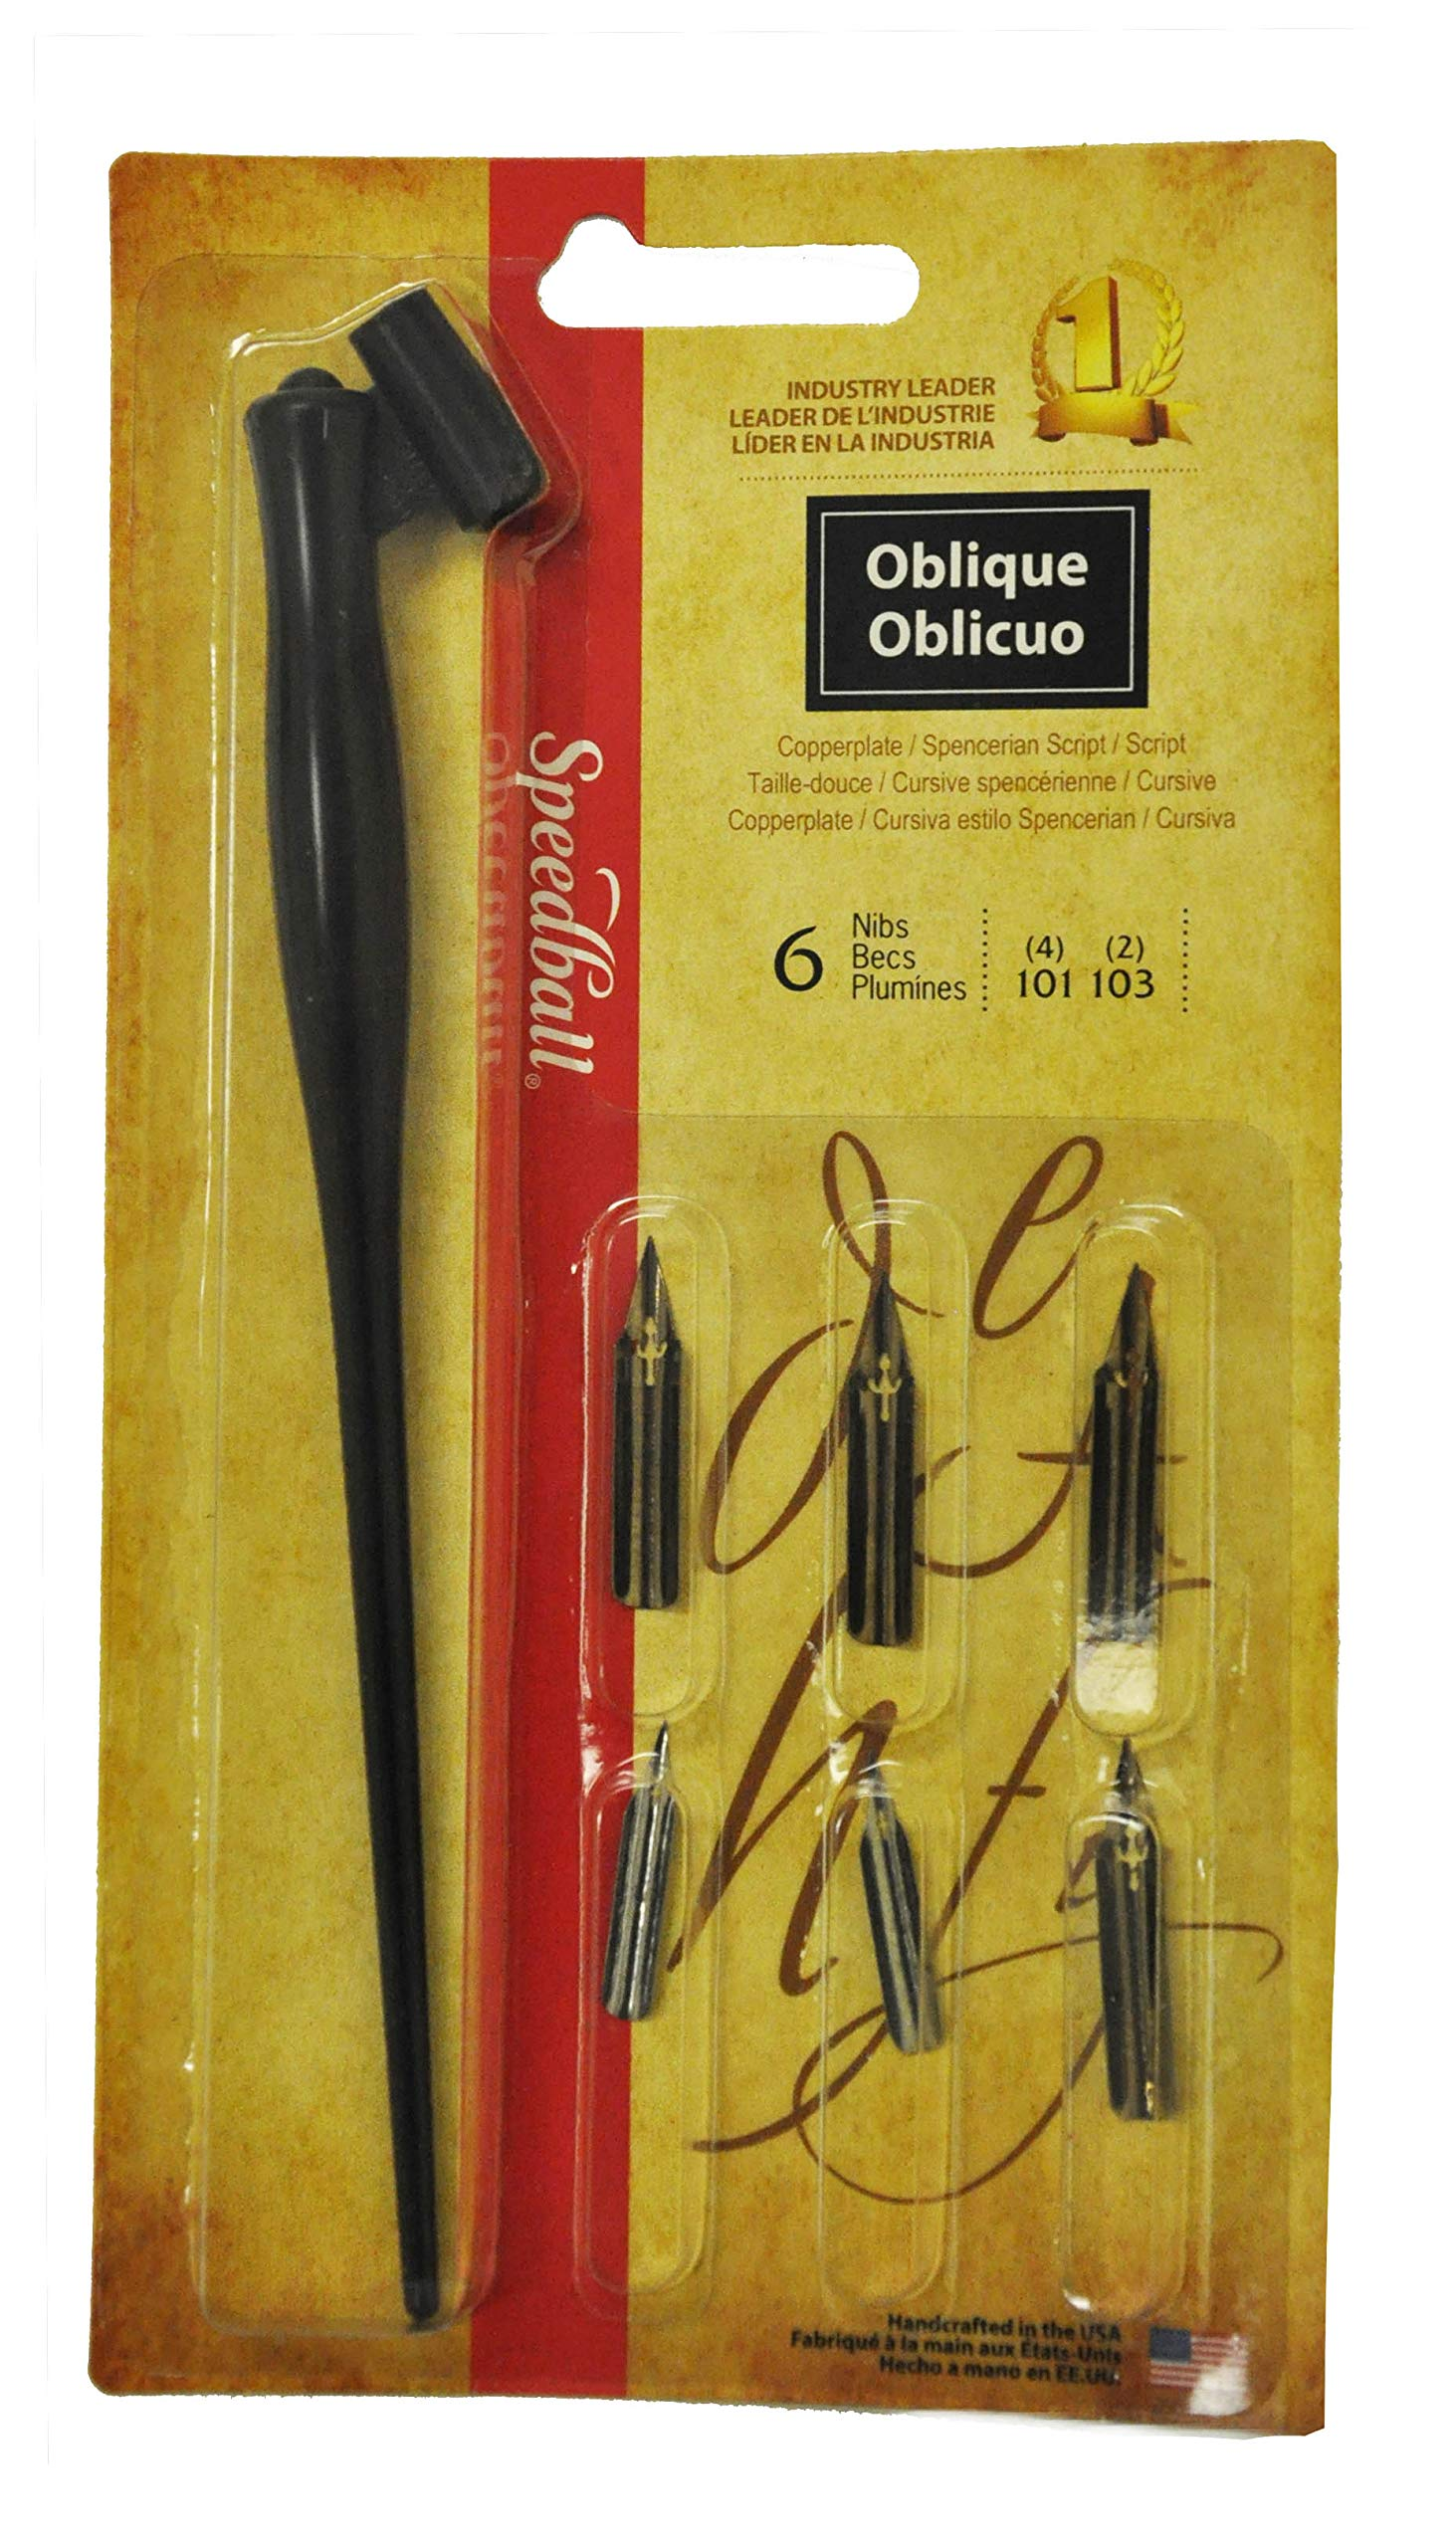 Speedball Oblique Pen Set - 1 Penholder w/ 4 Nibs, 2 Pen Points